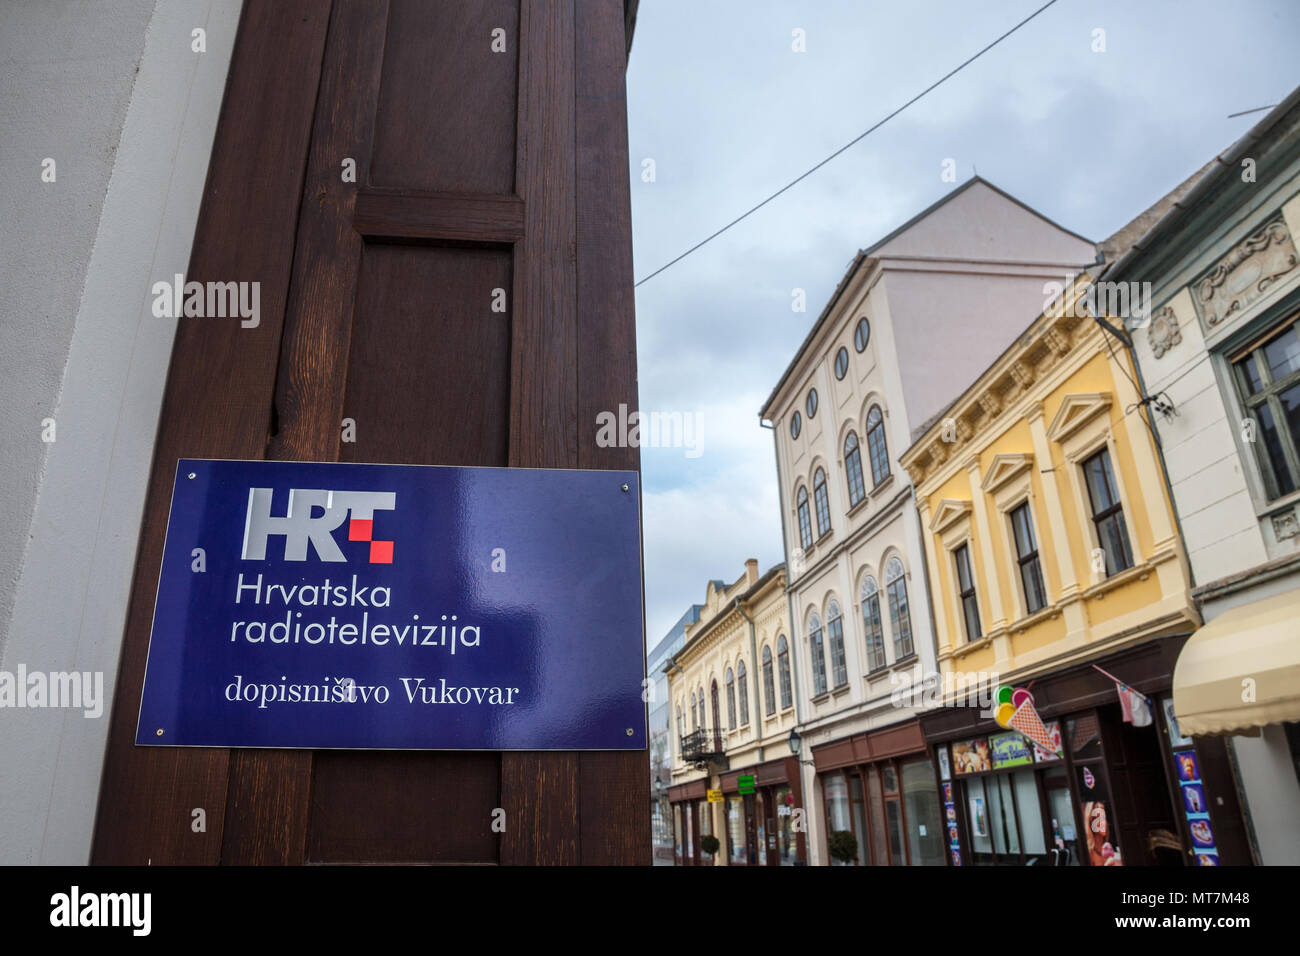 VUKOVAR, CROATIA - FEBRUARY 25, 2018: HRT logo on their office in Vukovar. HRT, or Hrvatska Radiotelevizija, or Croatian Radiotelevision, is the publi - Stock Image